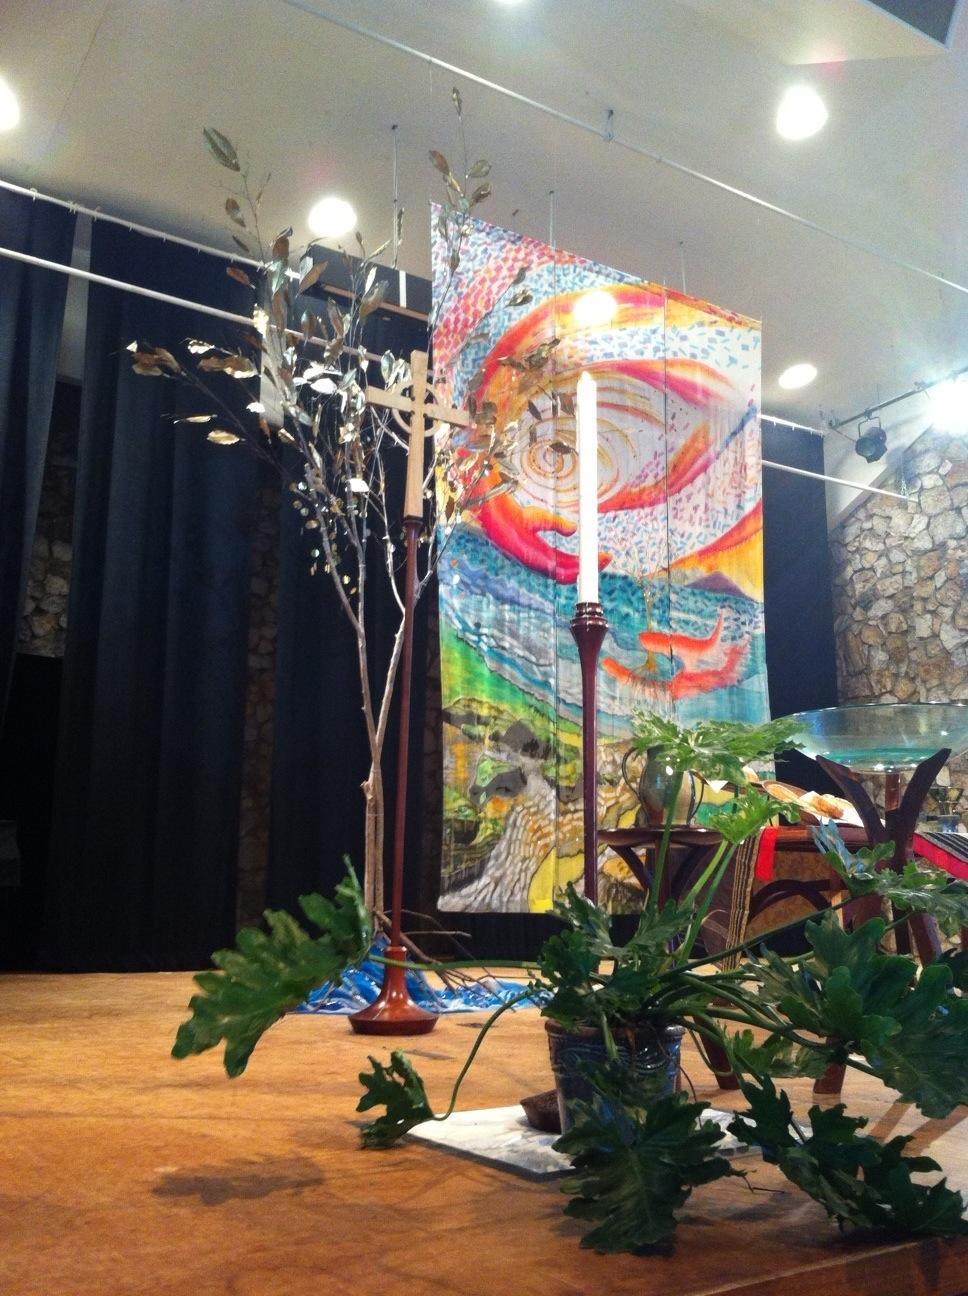 decorations in sanctuary